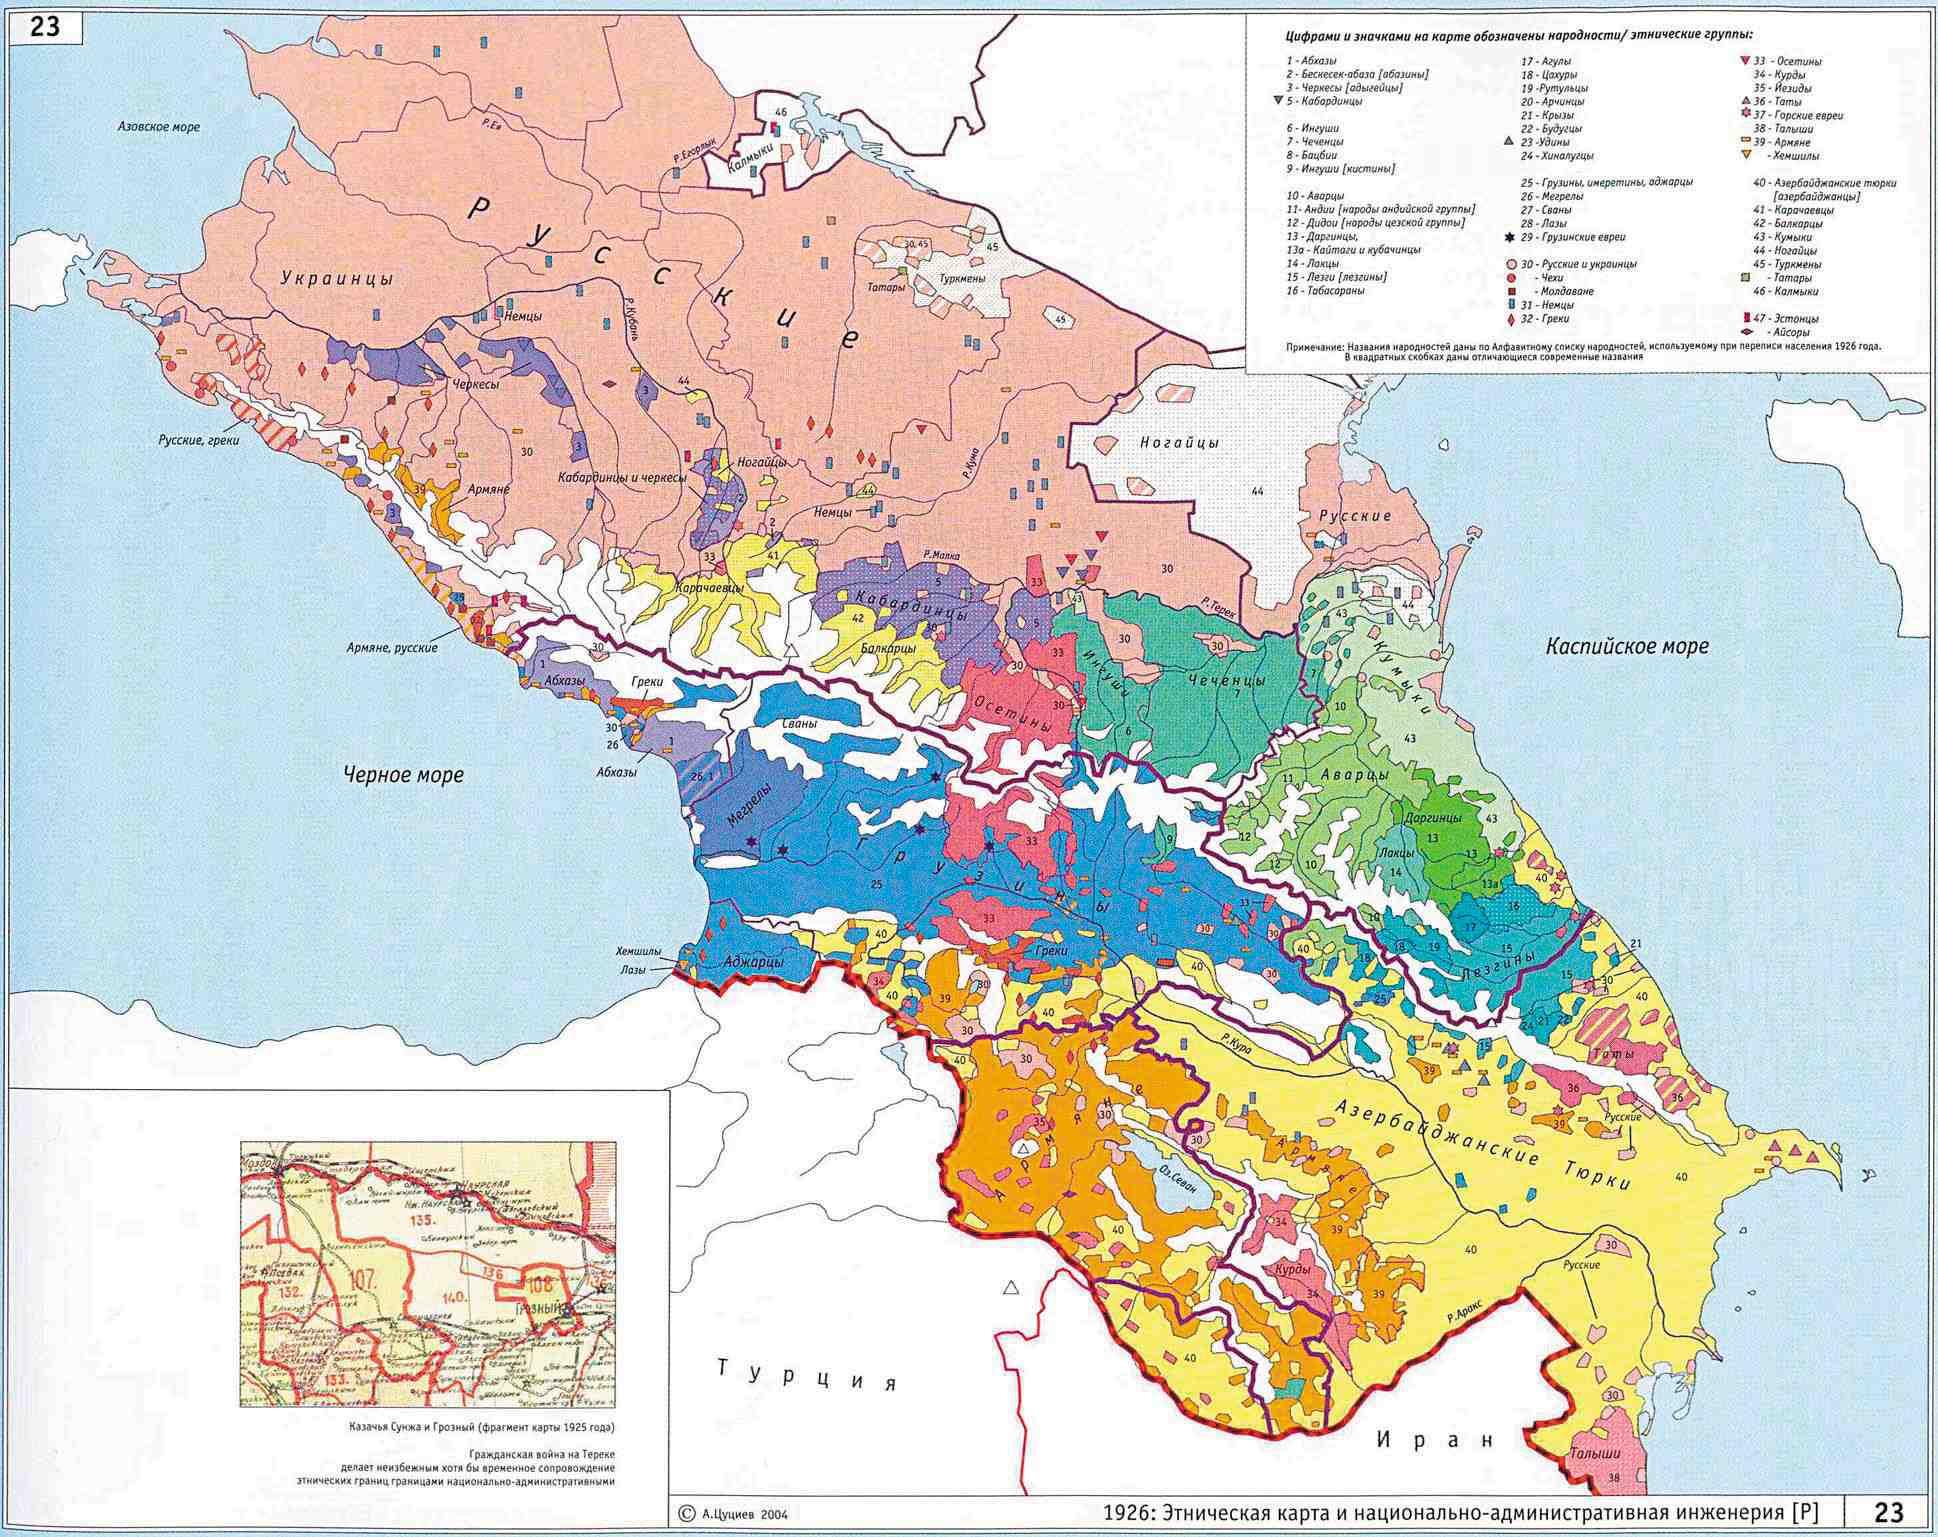 http://www.iriston.com/nogbon/pictures/Tabol/etno_map/map23.jpg